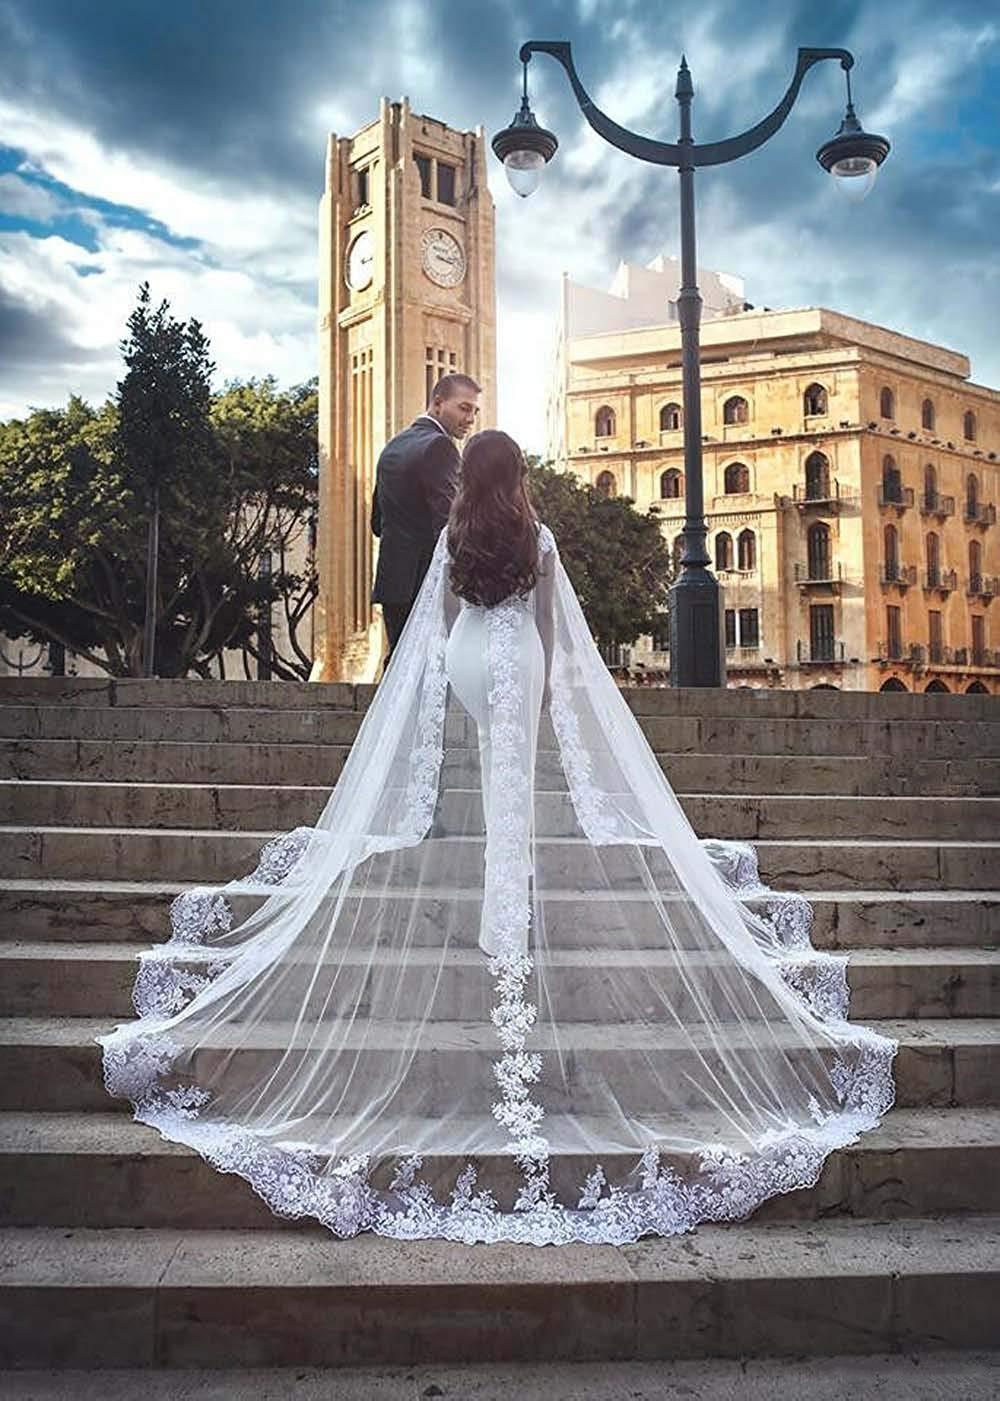 Walk Beside You Bolero Women Wedding Accessories Long Train Tulle Lace Applique Cape Bridal Shawl Cloack Shrug Mariage 2020